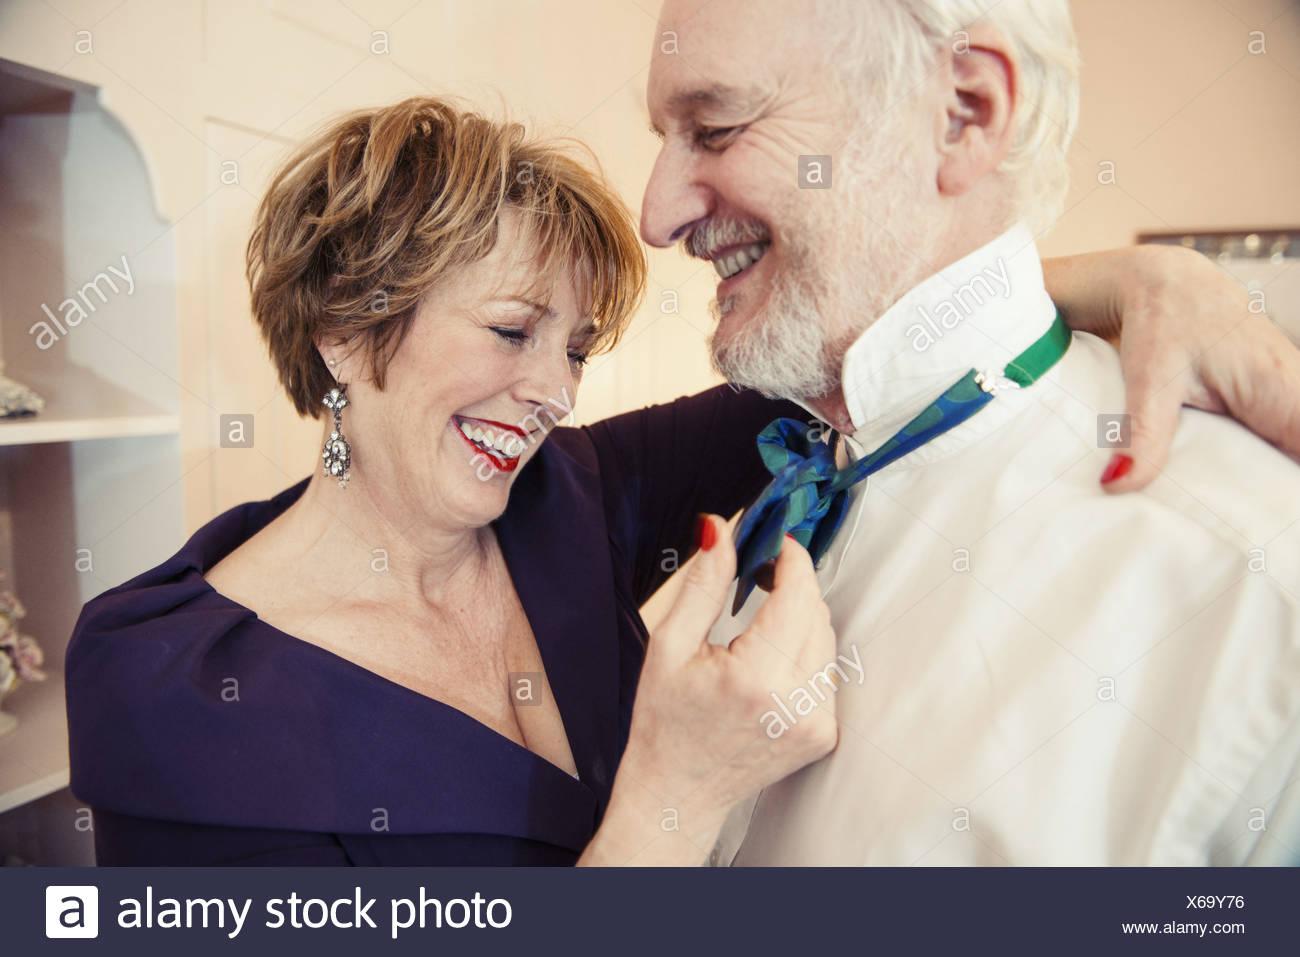 Mature woman putting bow tie on senior man - Stock Image